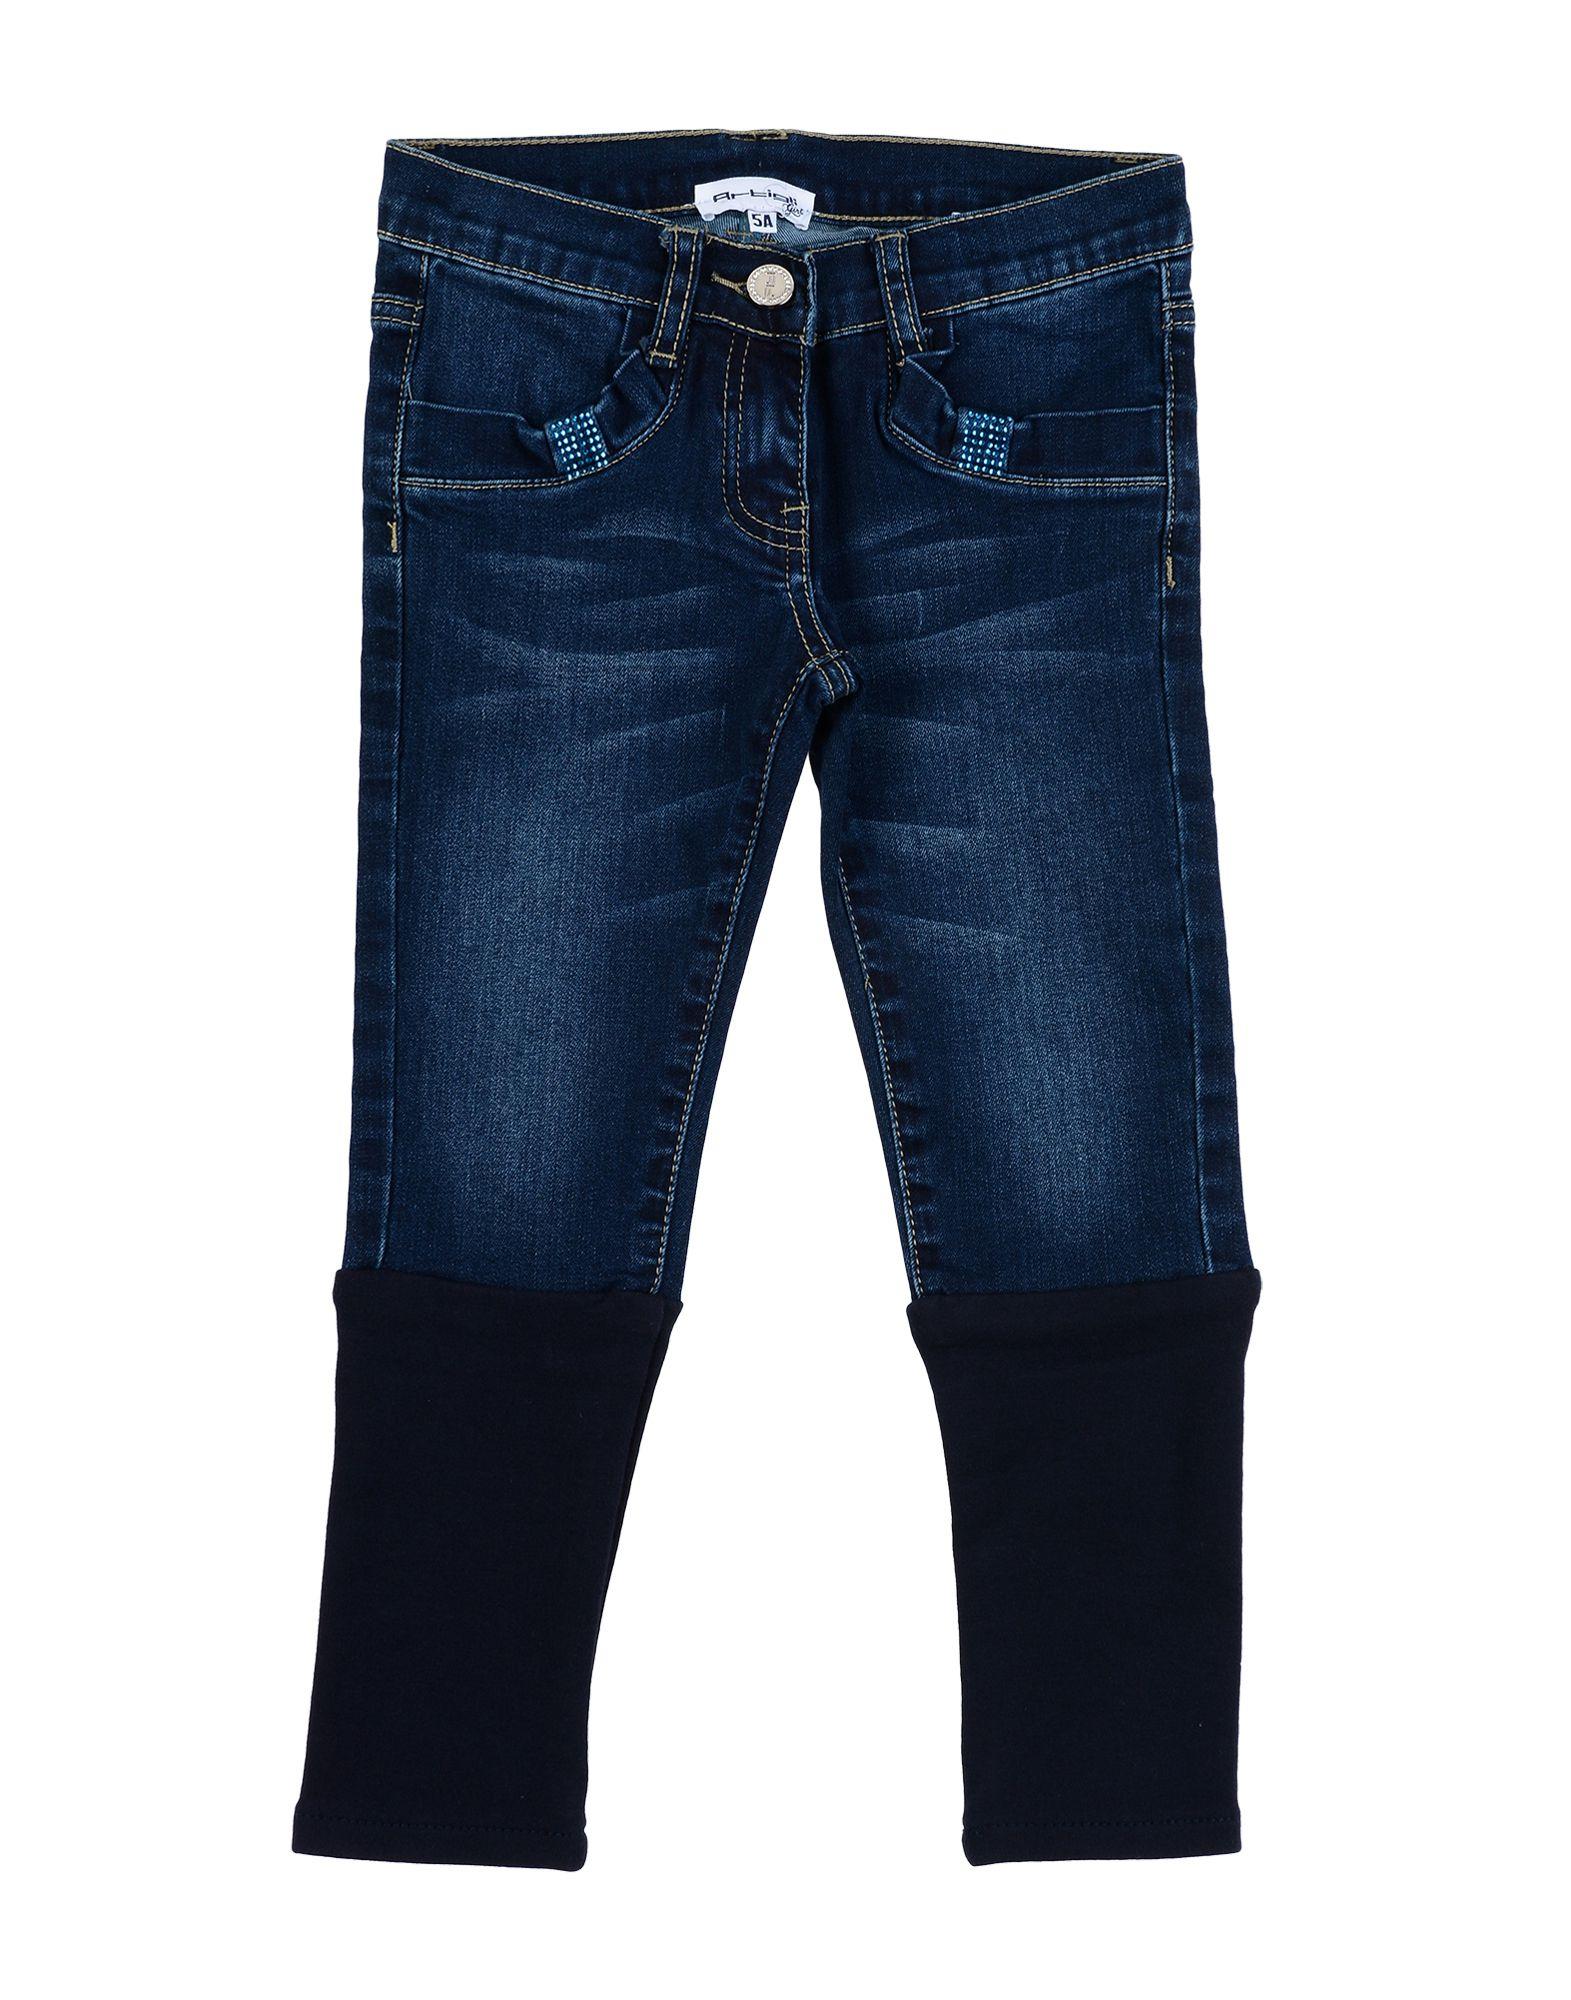 ARTIGLI Girl Джинсовые брюки artigli a09446 artigli